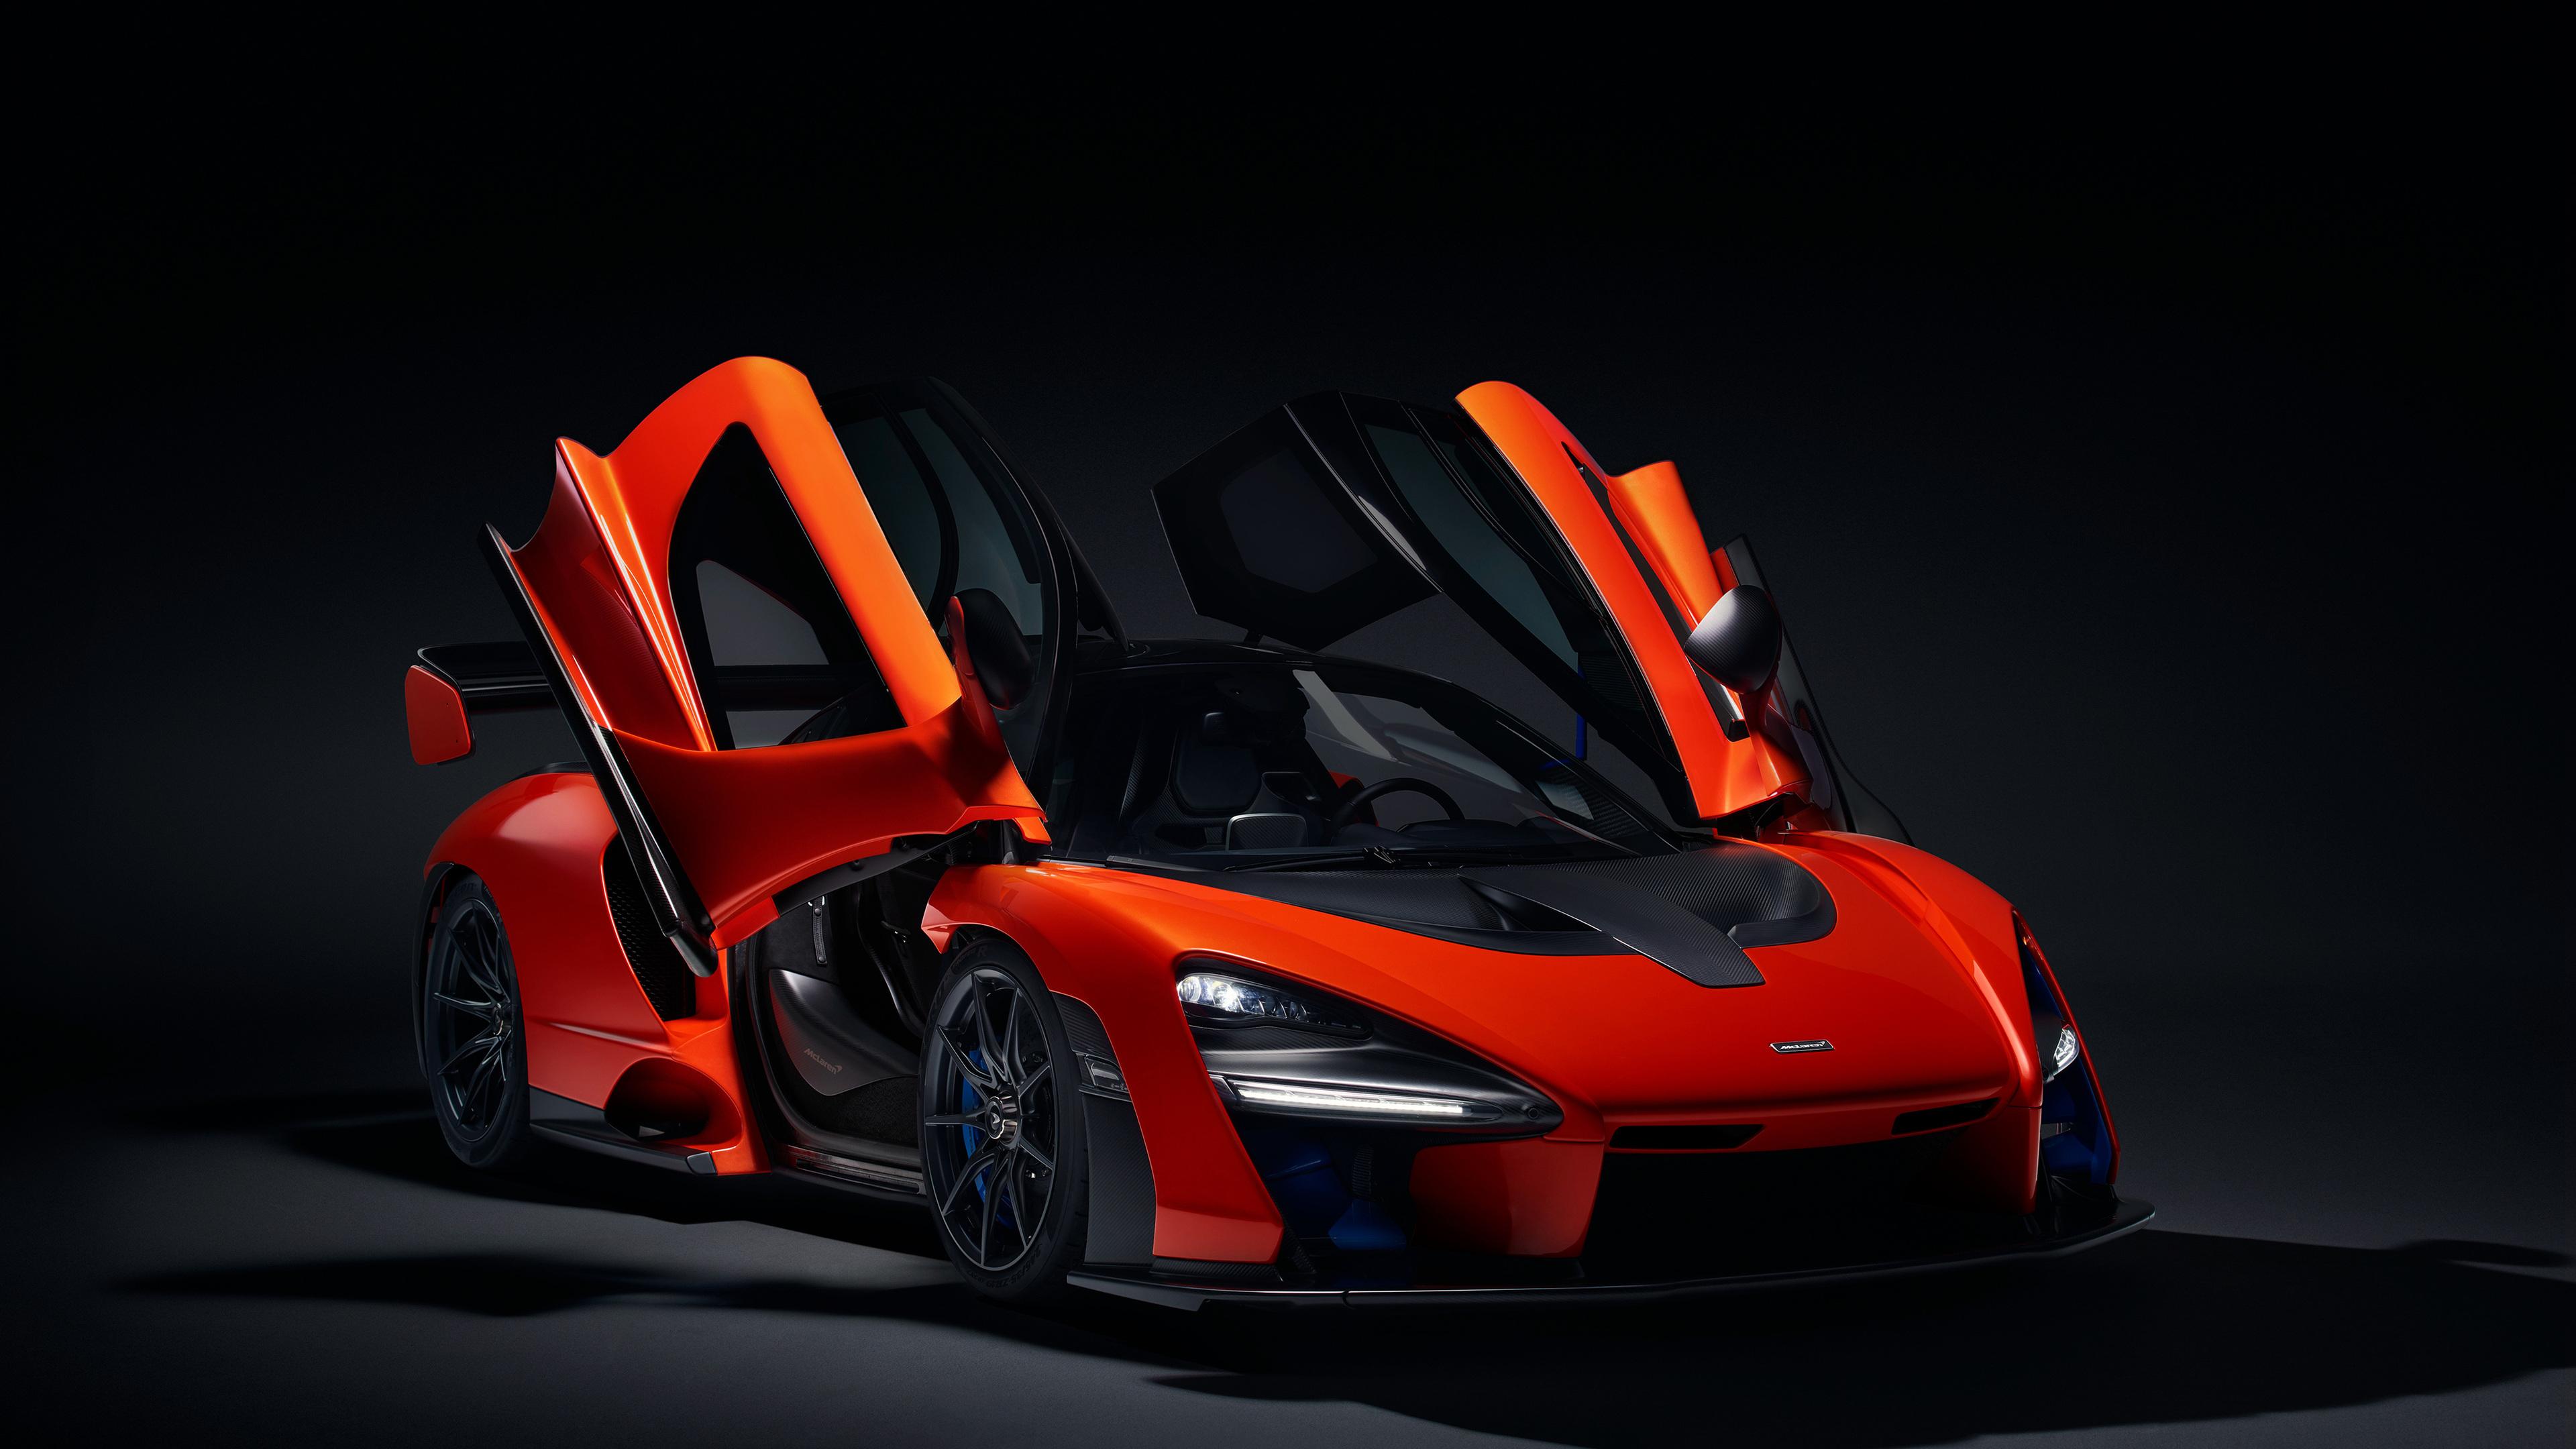 mclaren senna doors up 1539108656 - McLaren Senna Doors Up - mclaren wallpapers, mclaren senna wallpapers, hd-wallpapers, 4k-wallpapers, 2018 cars wallpapers